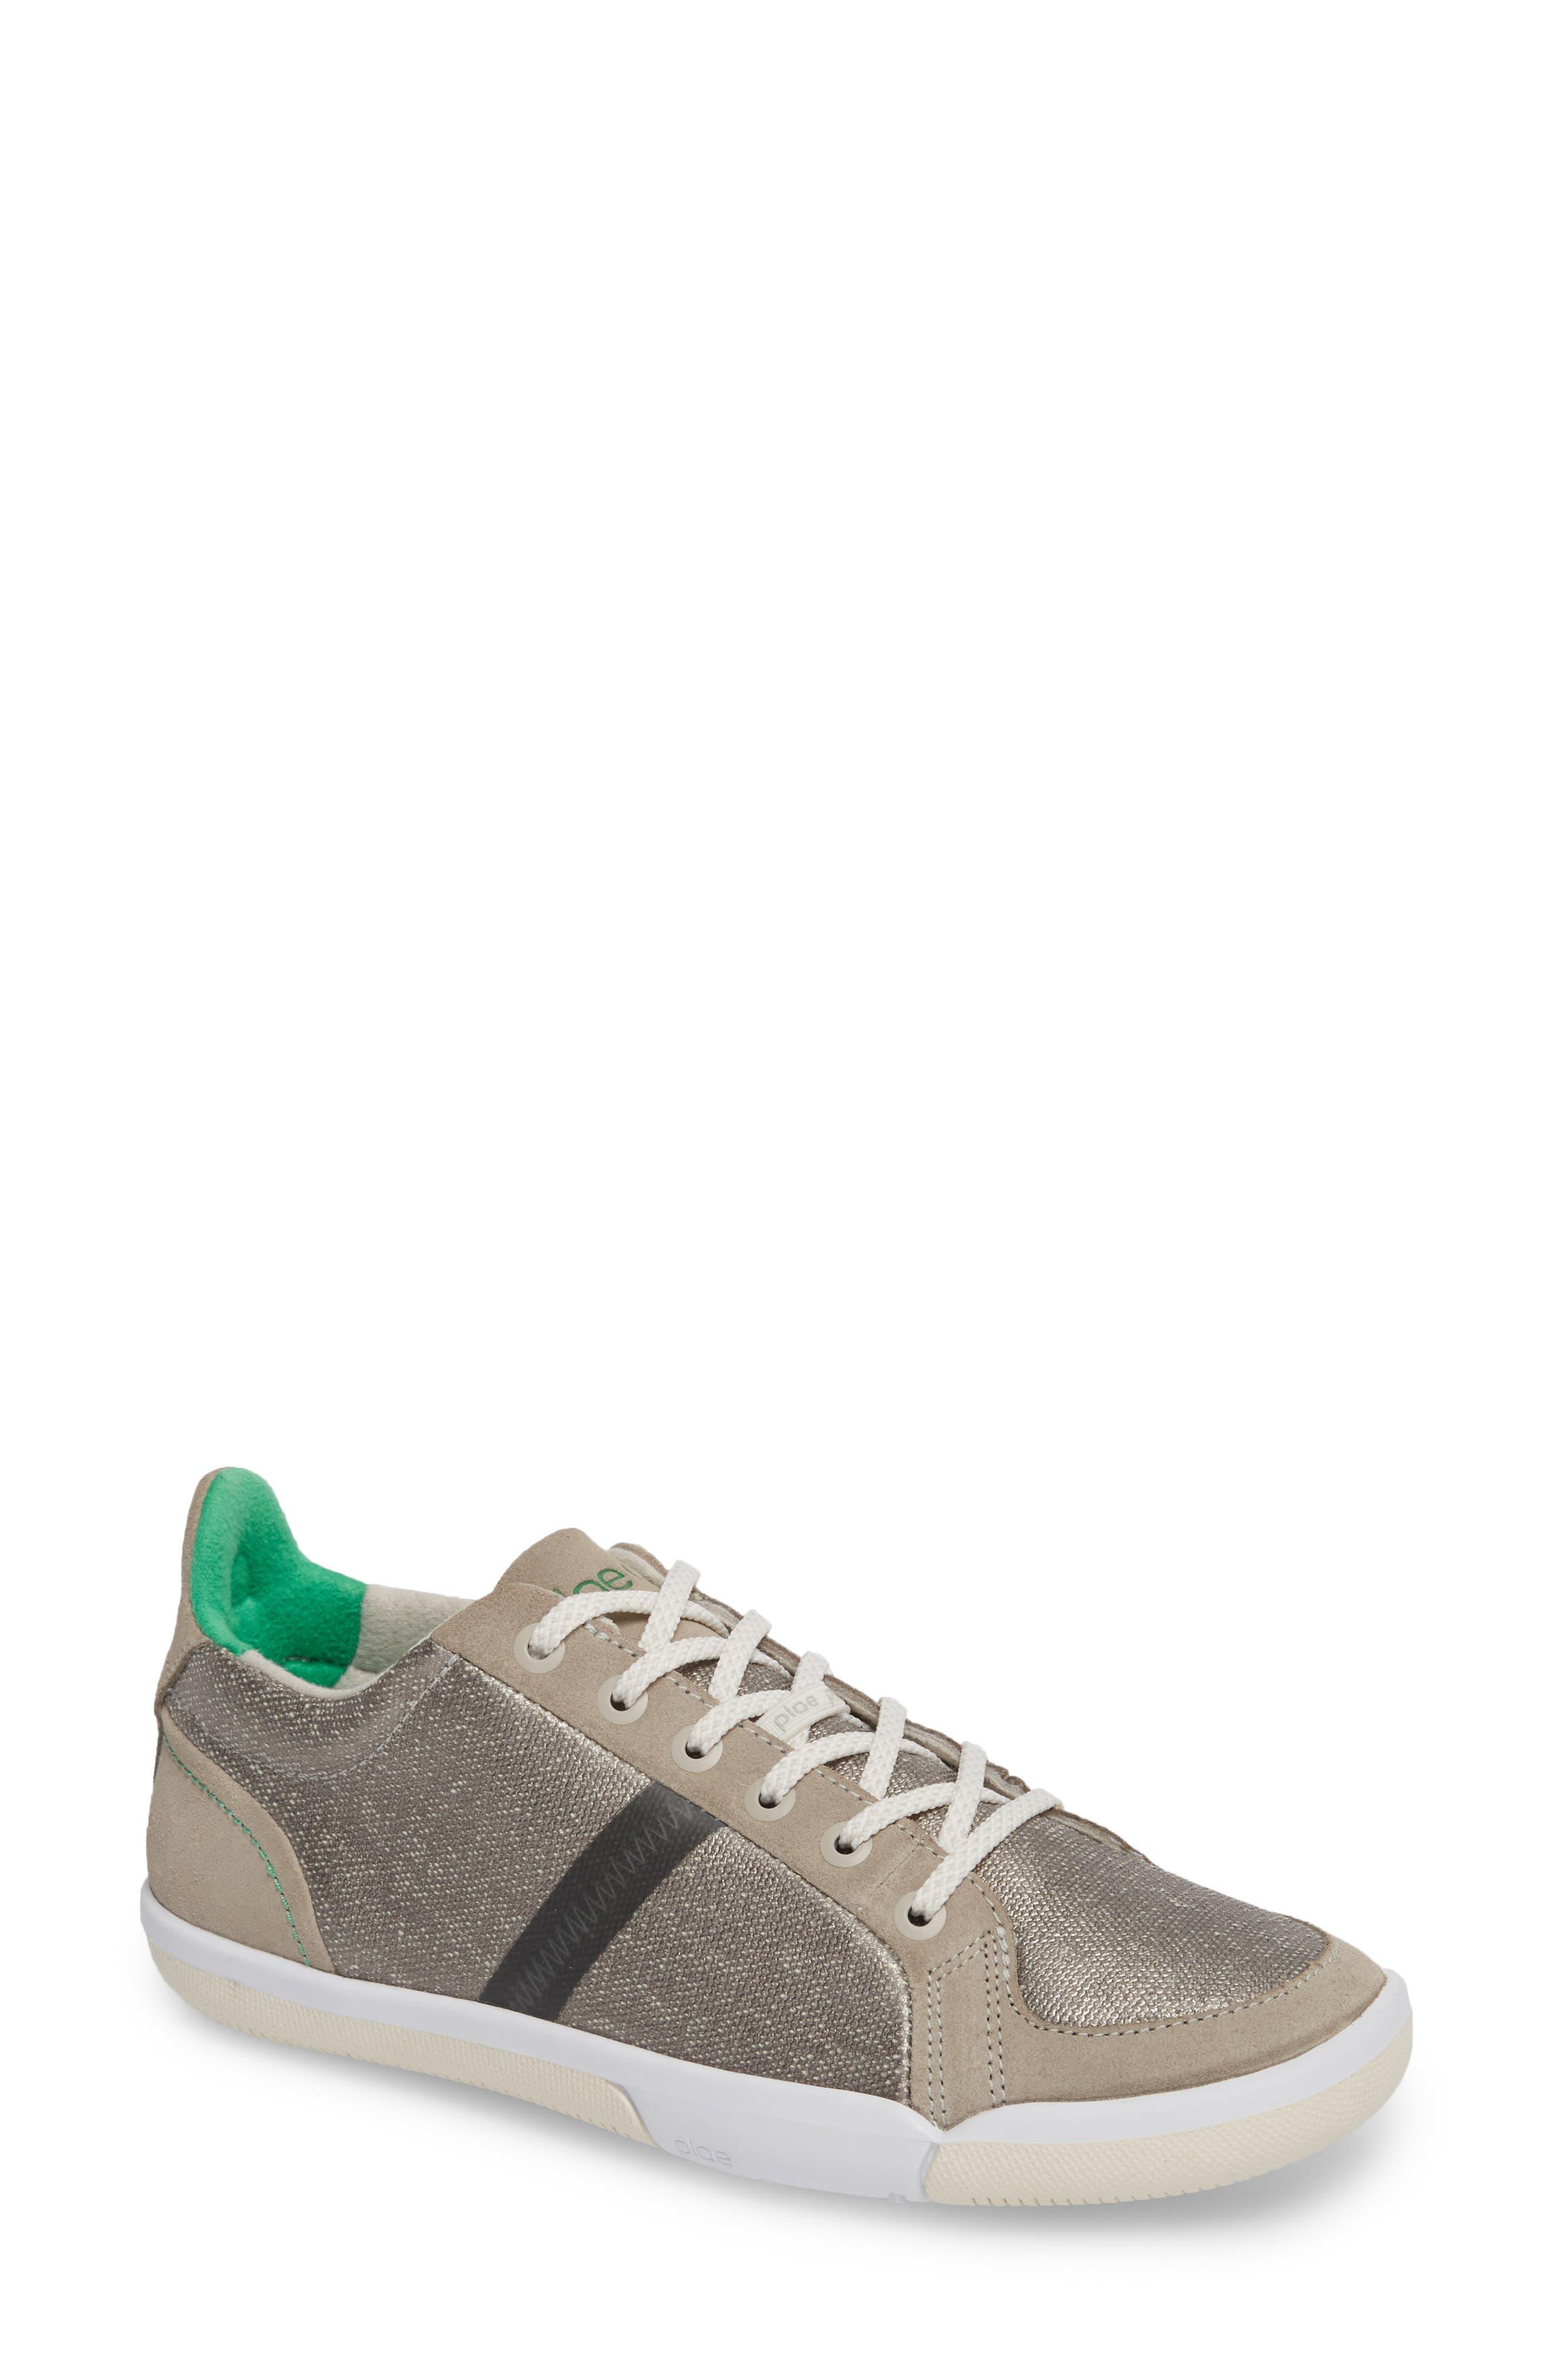 Prospect Sneaker,                         Main,                         color, Grey